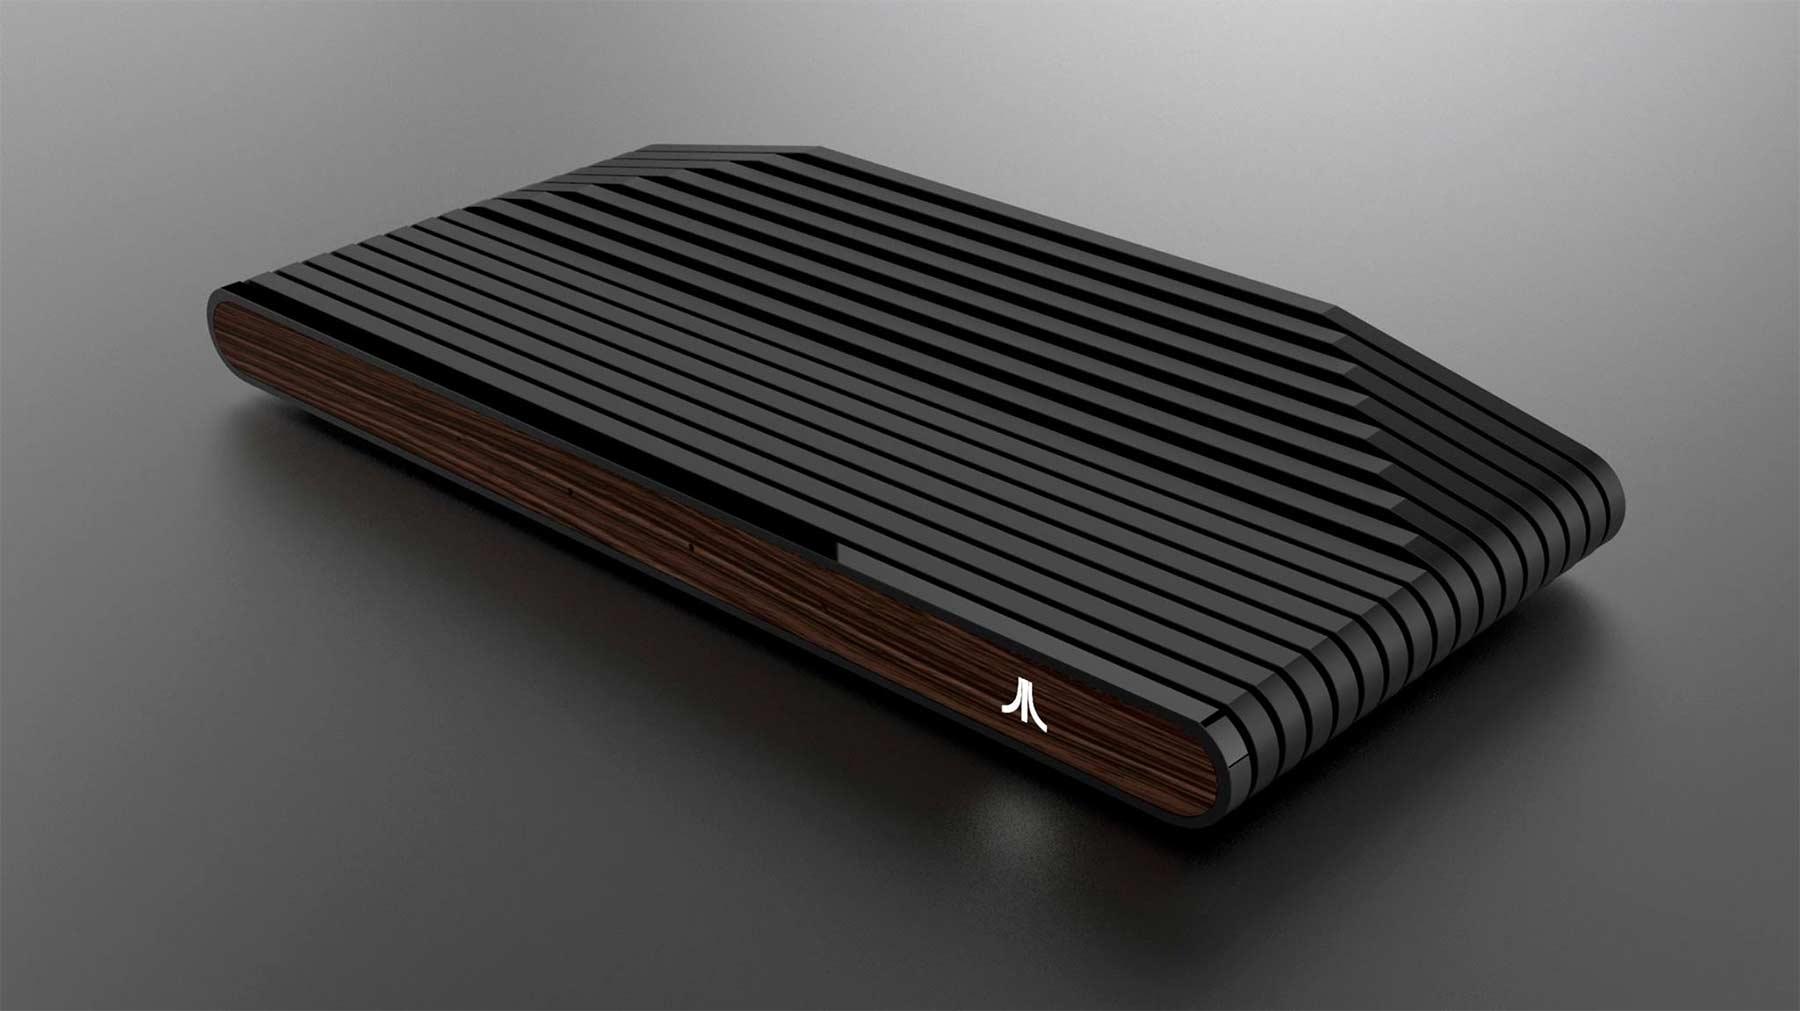 So soll die neue Atari-Konsole aussehen Ataribox_01